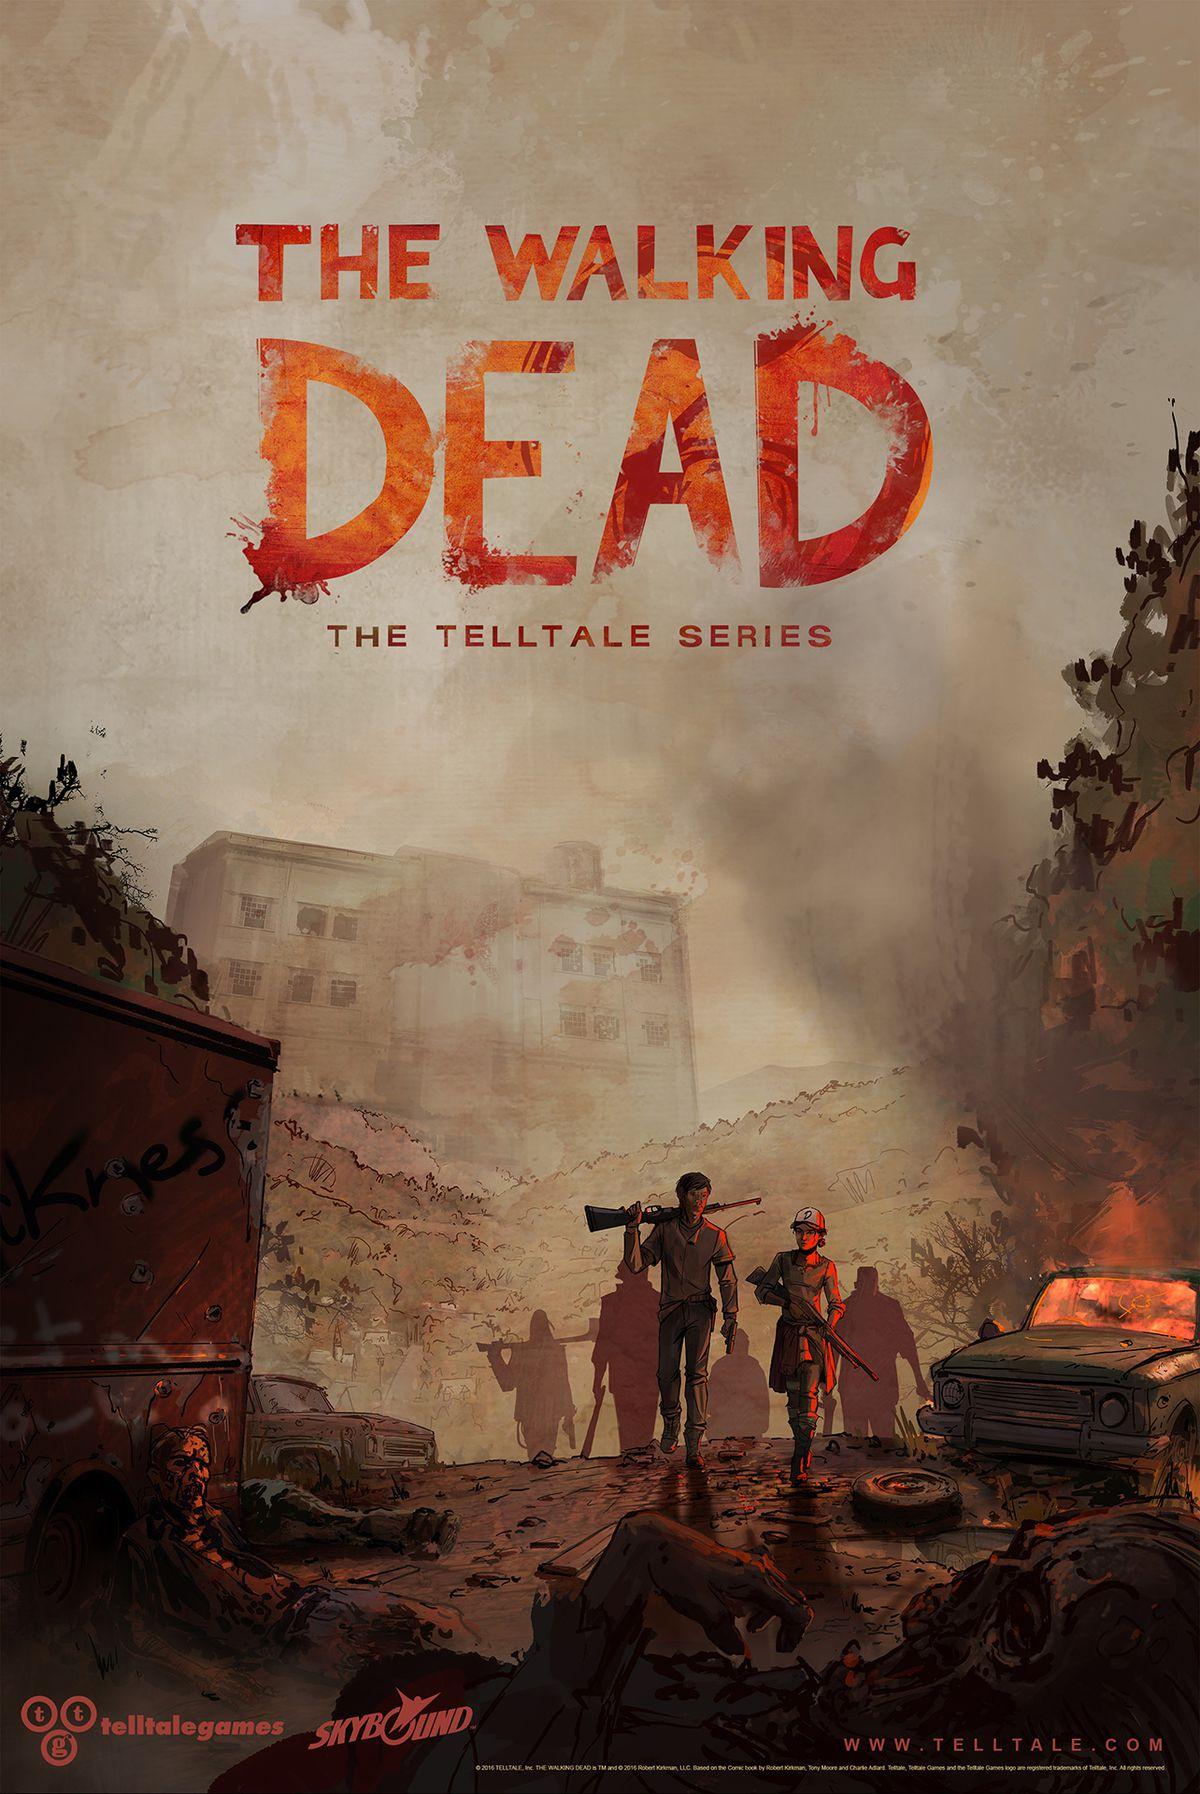 Telltale details The Walking Dead's third season in new